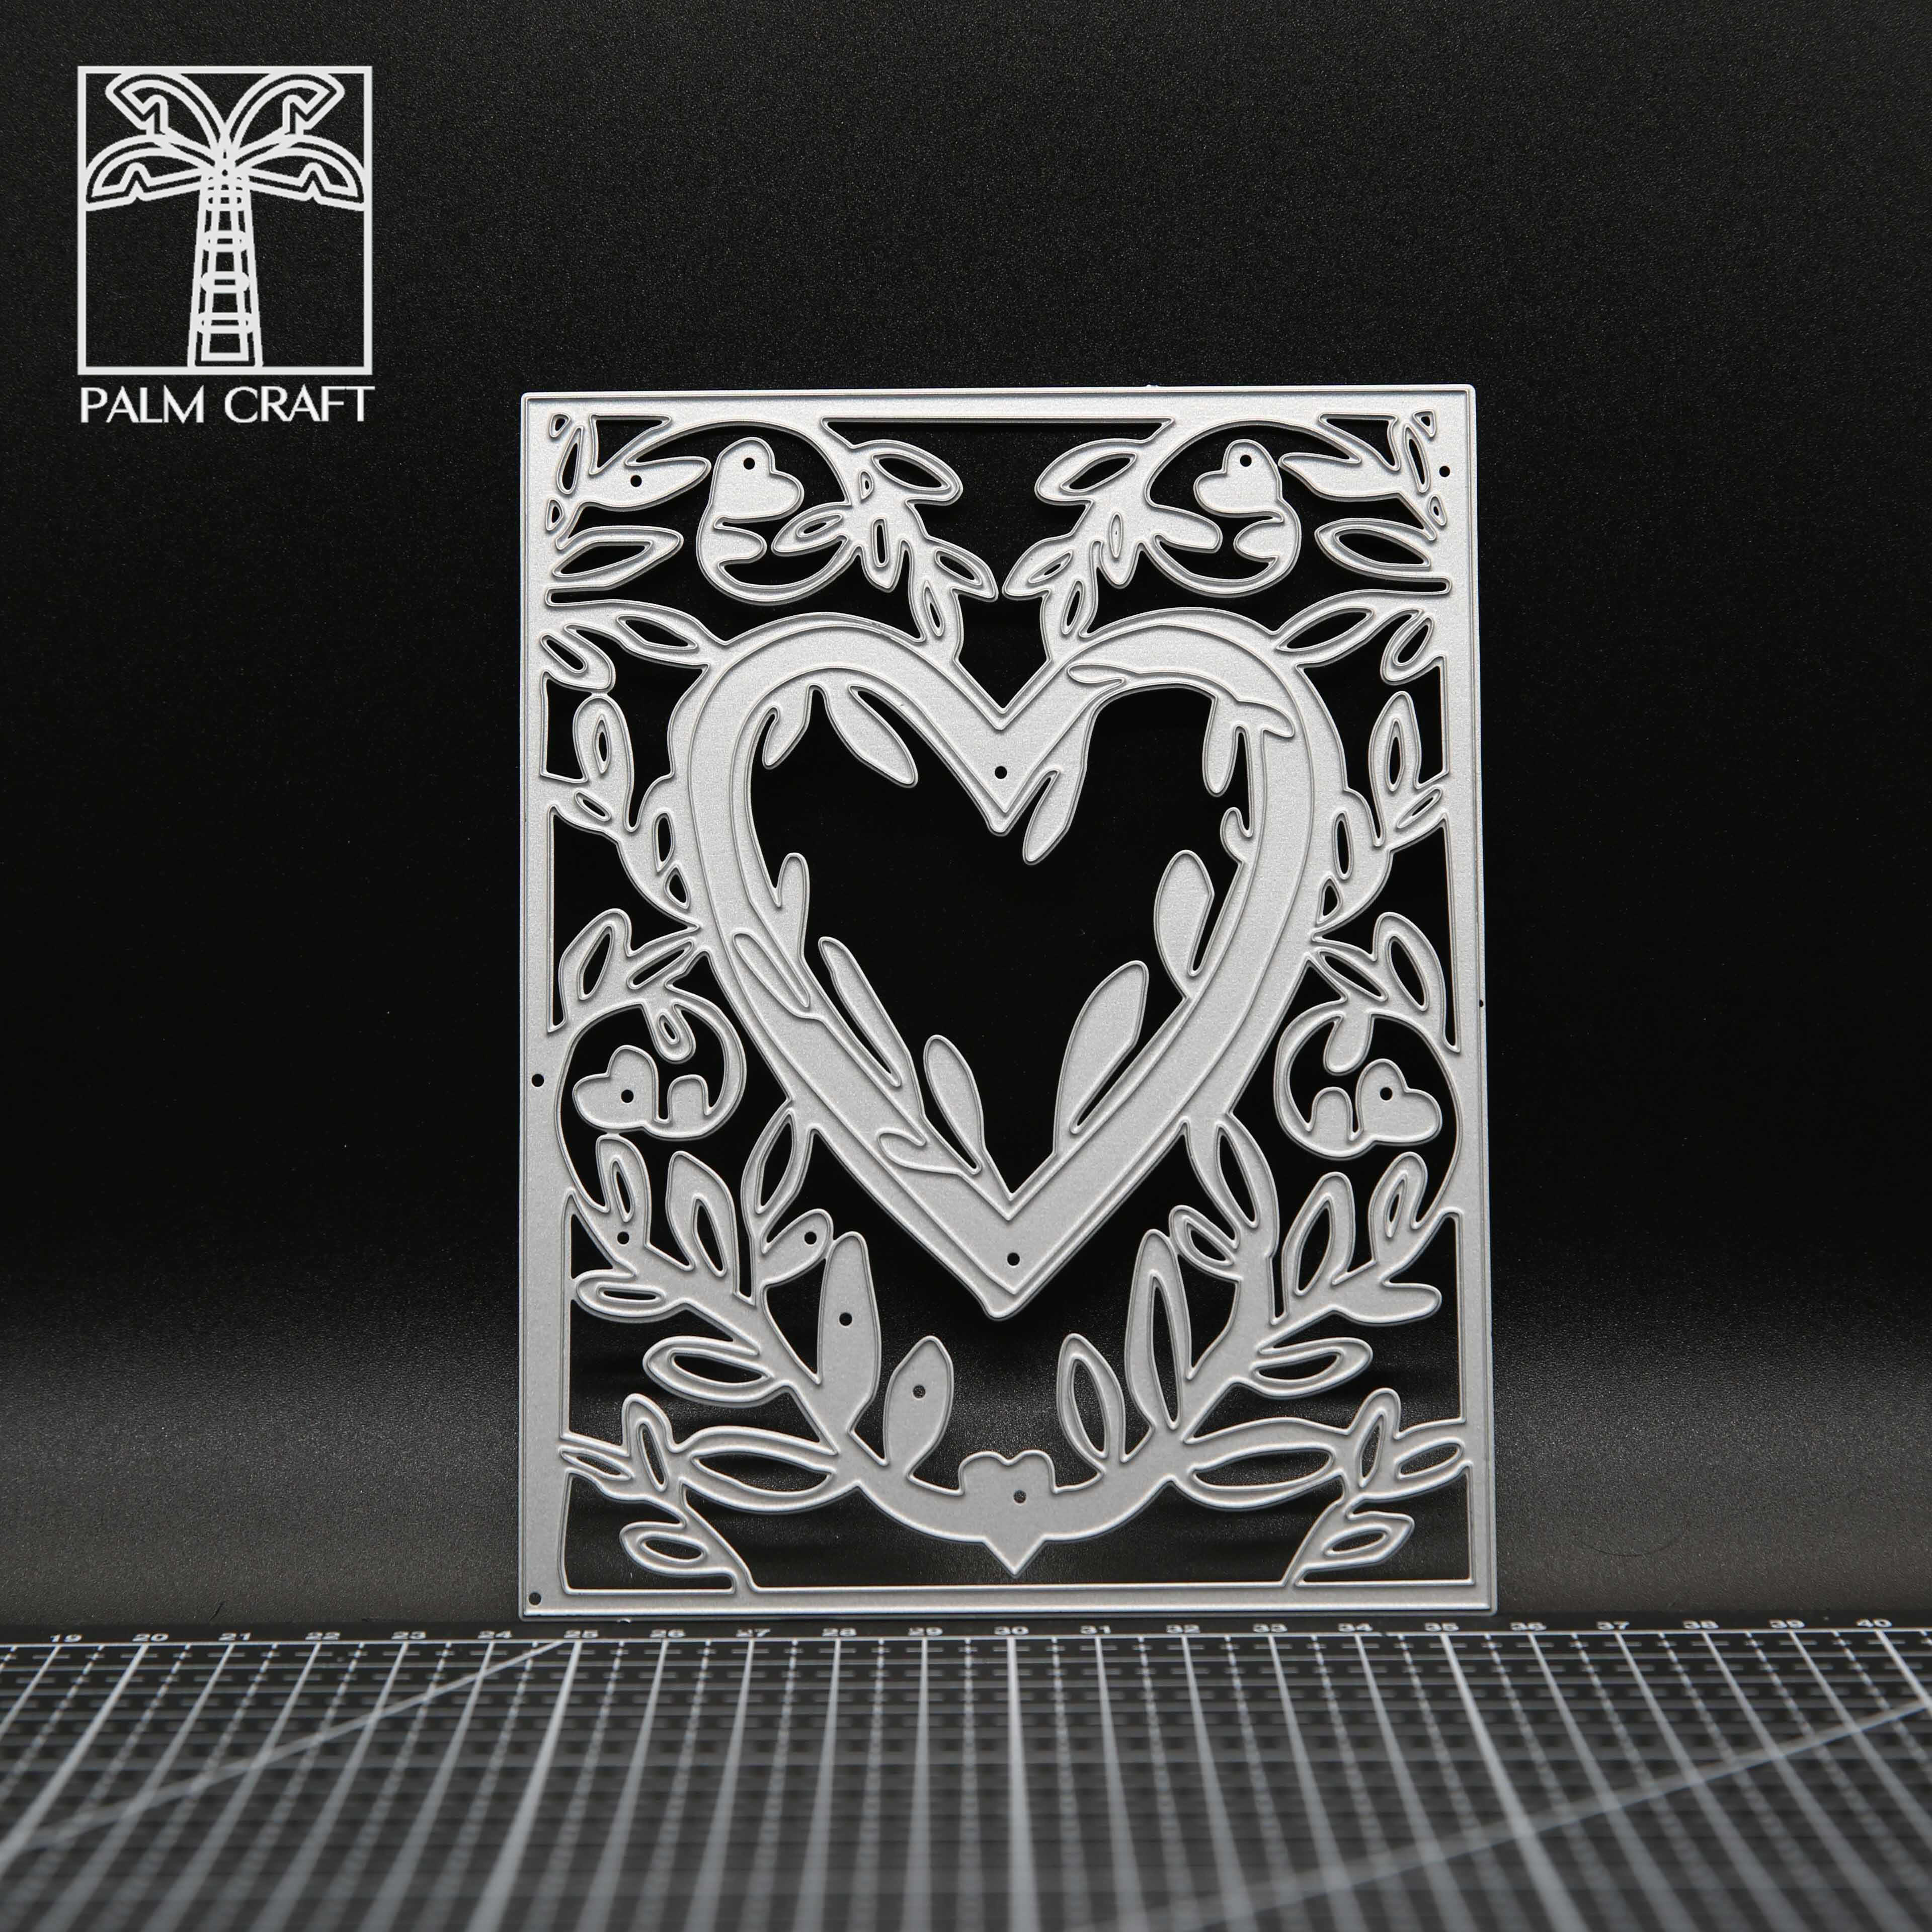 LoveHeart Corner Scrapbooking Metal Cutting Die stencil for Card Making Craft